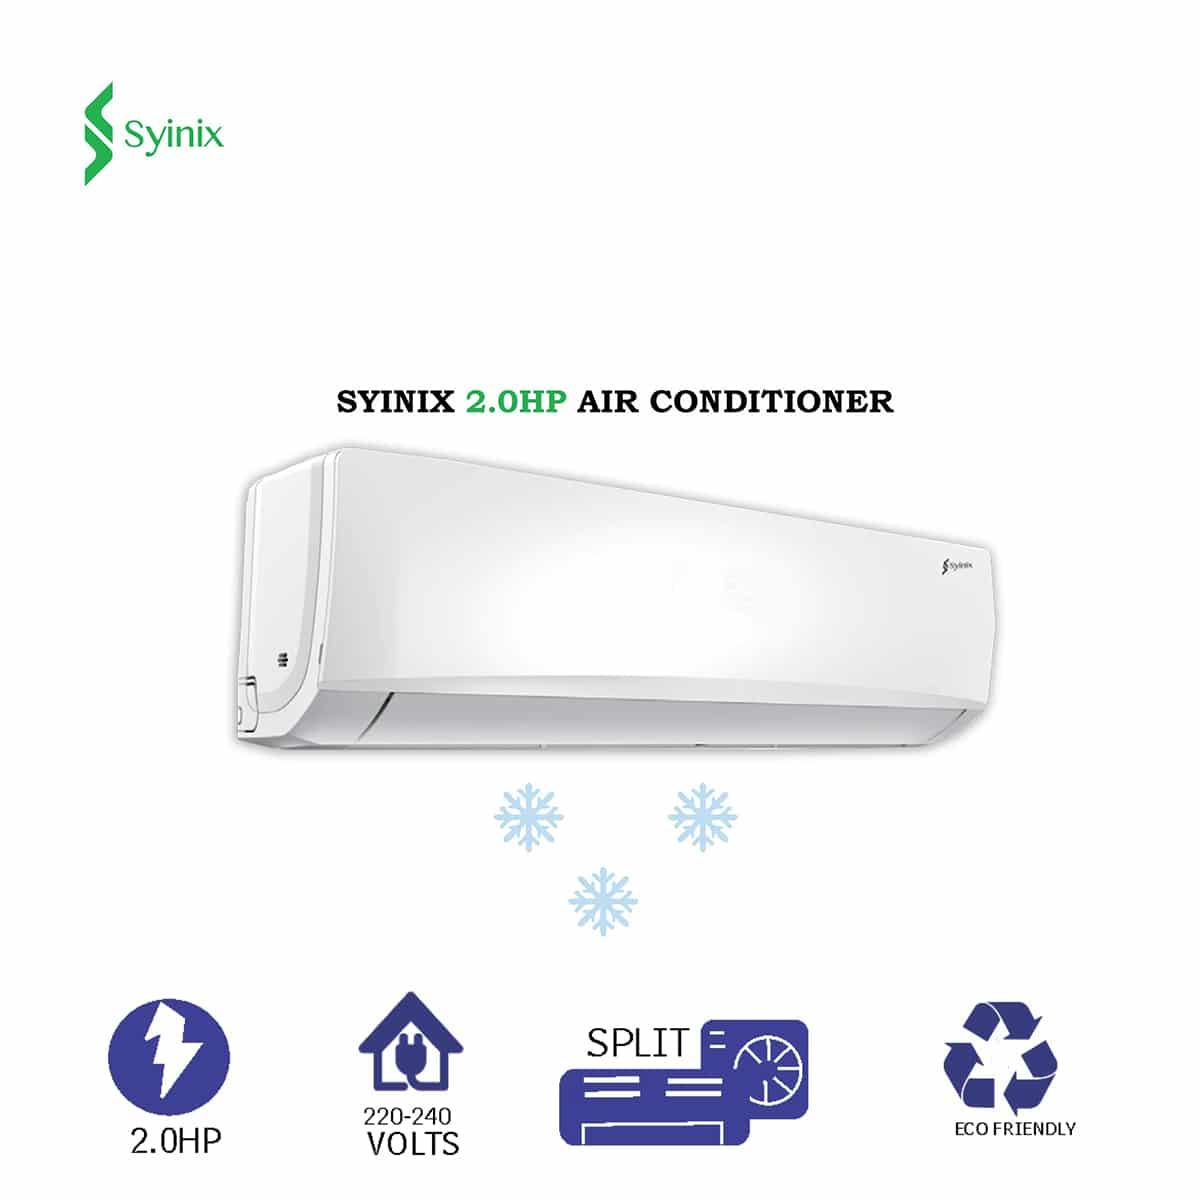 Syinix 2.0 hp Split Air Conditioner ACS12C03T